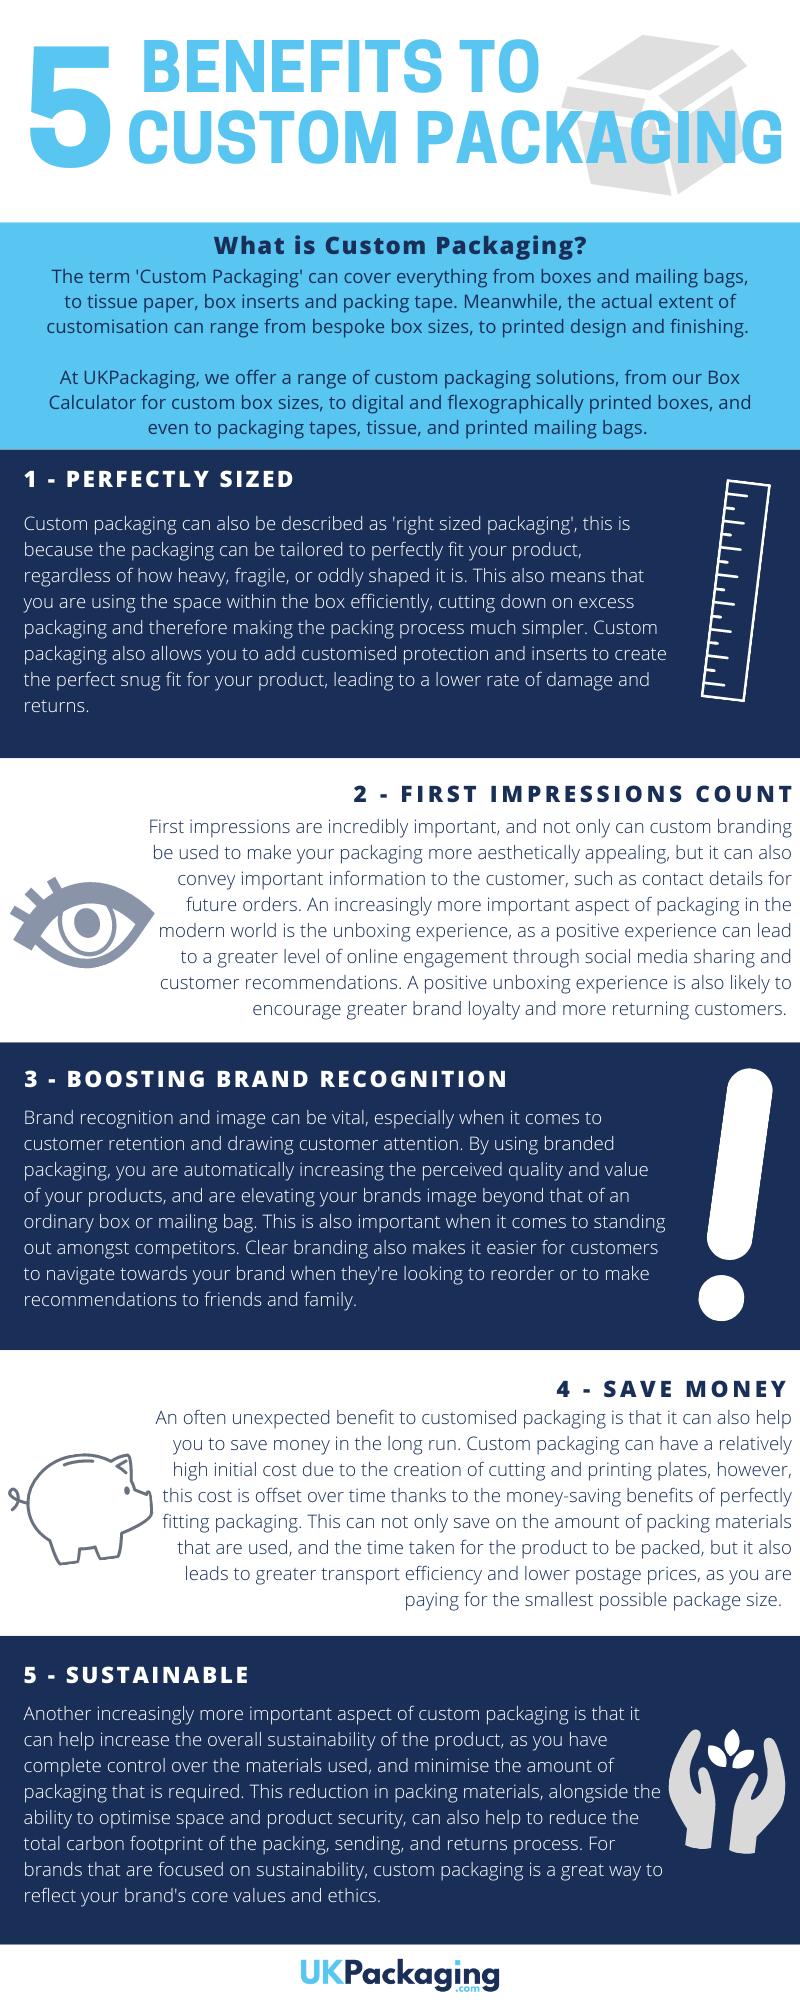 Reasons to use Custom Packaging